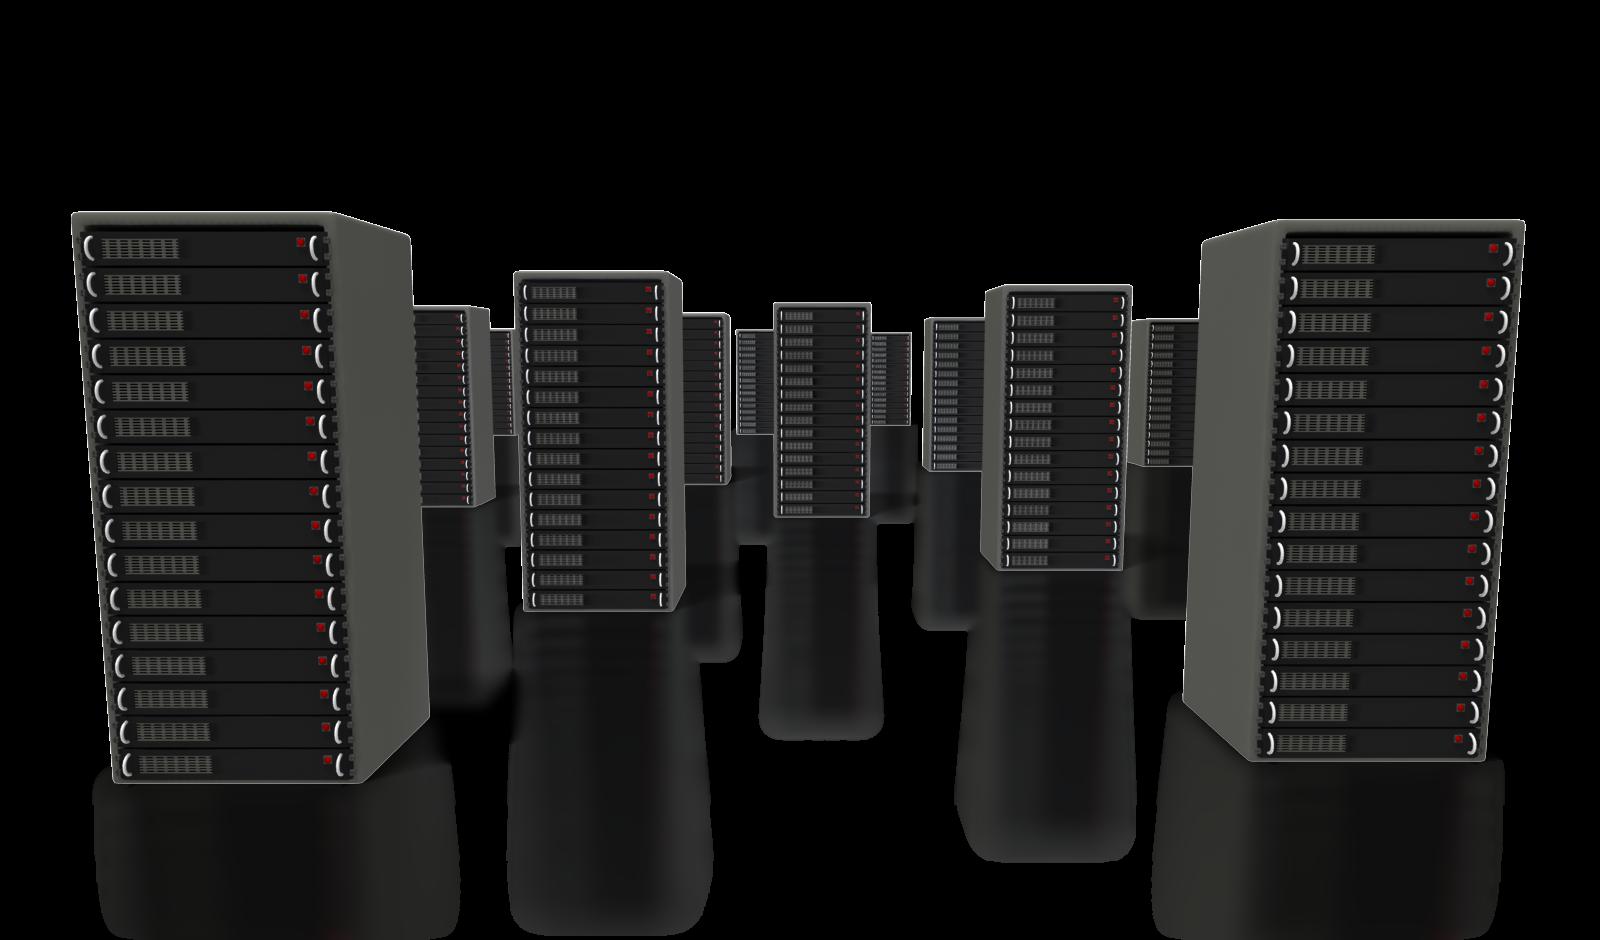 Image Gallery of Data Center Clip Art.